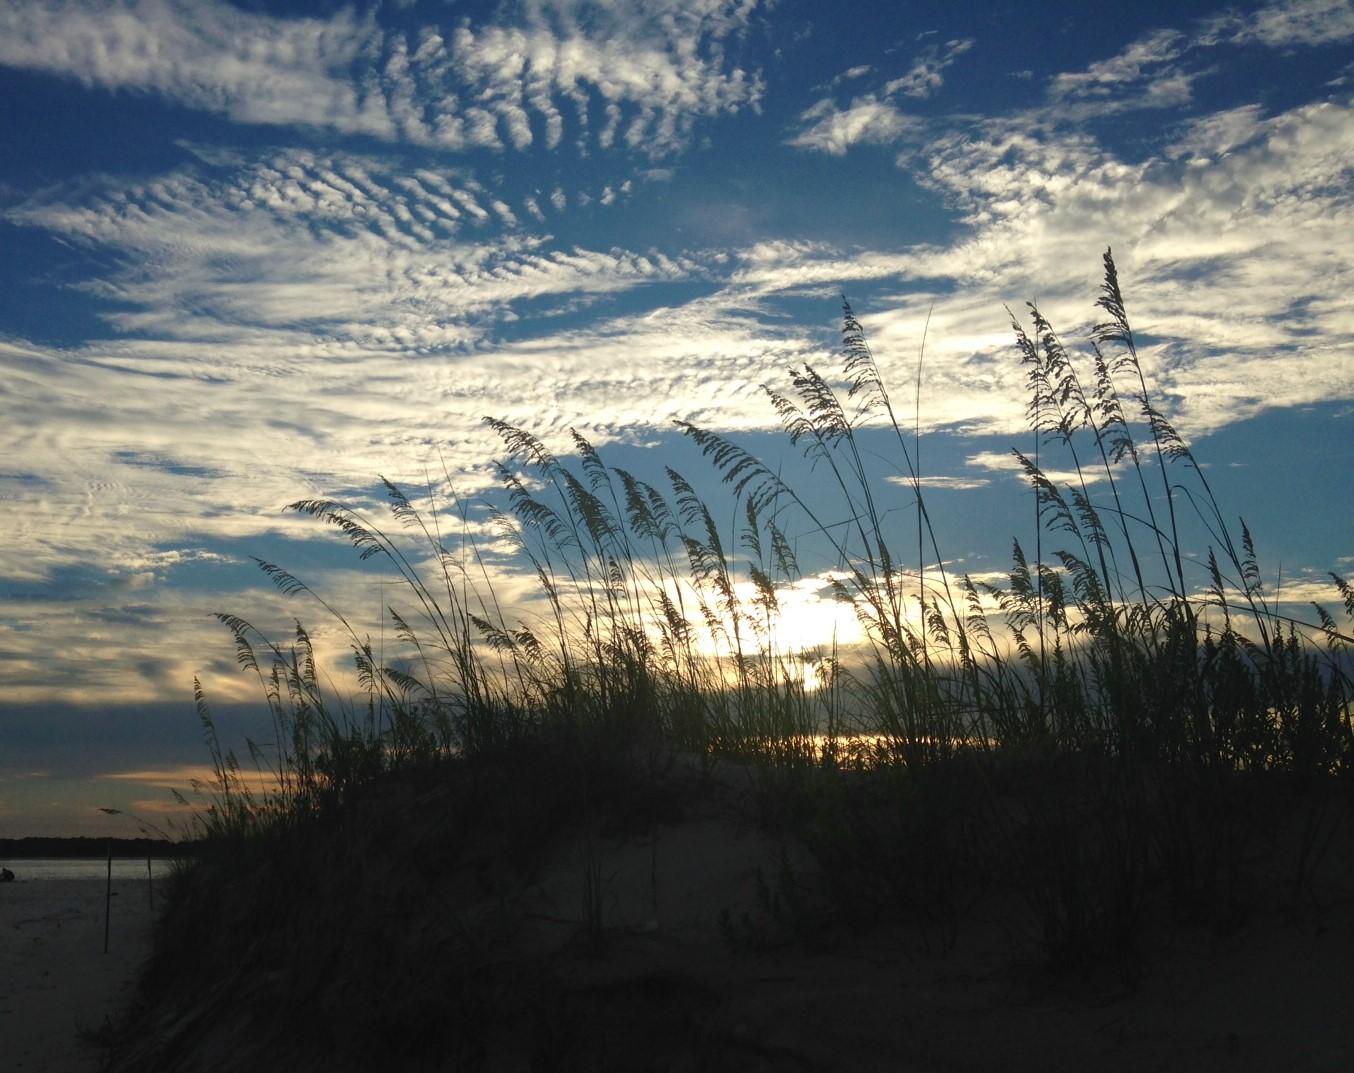 sea oats on sand dune at dusk